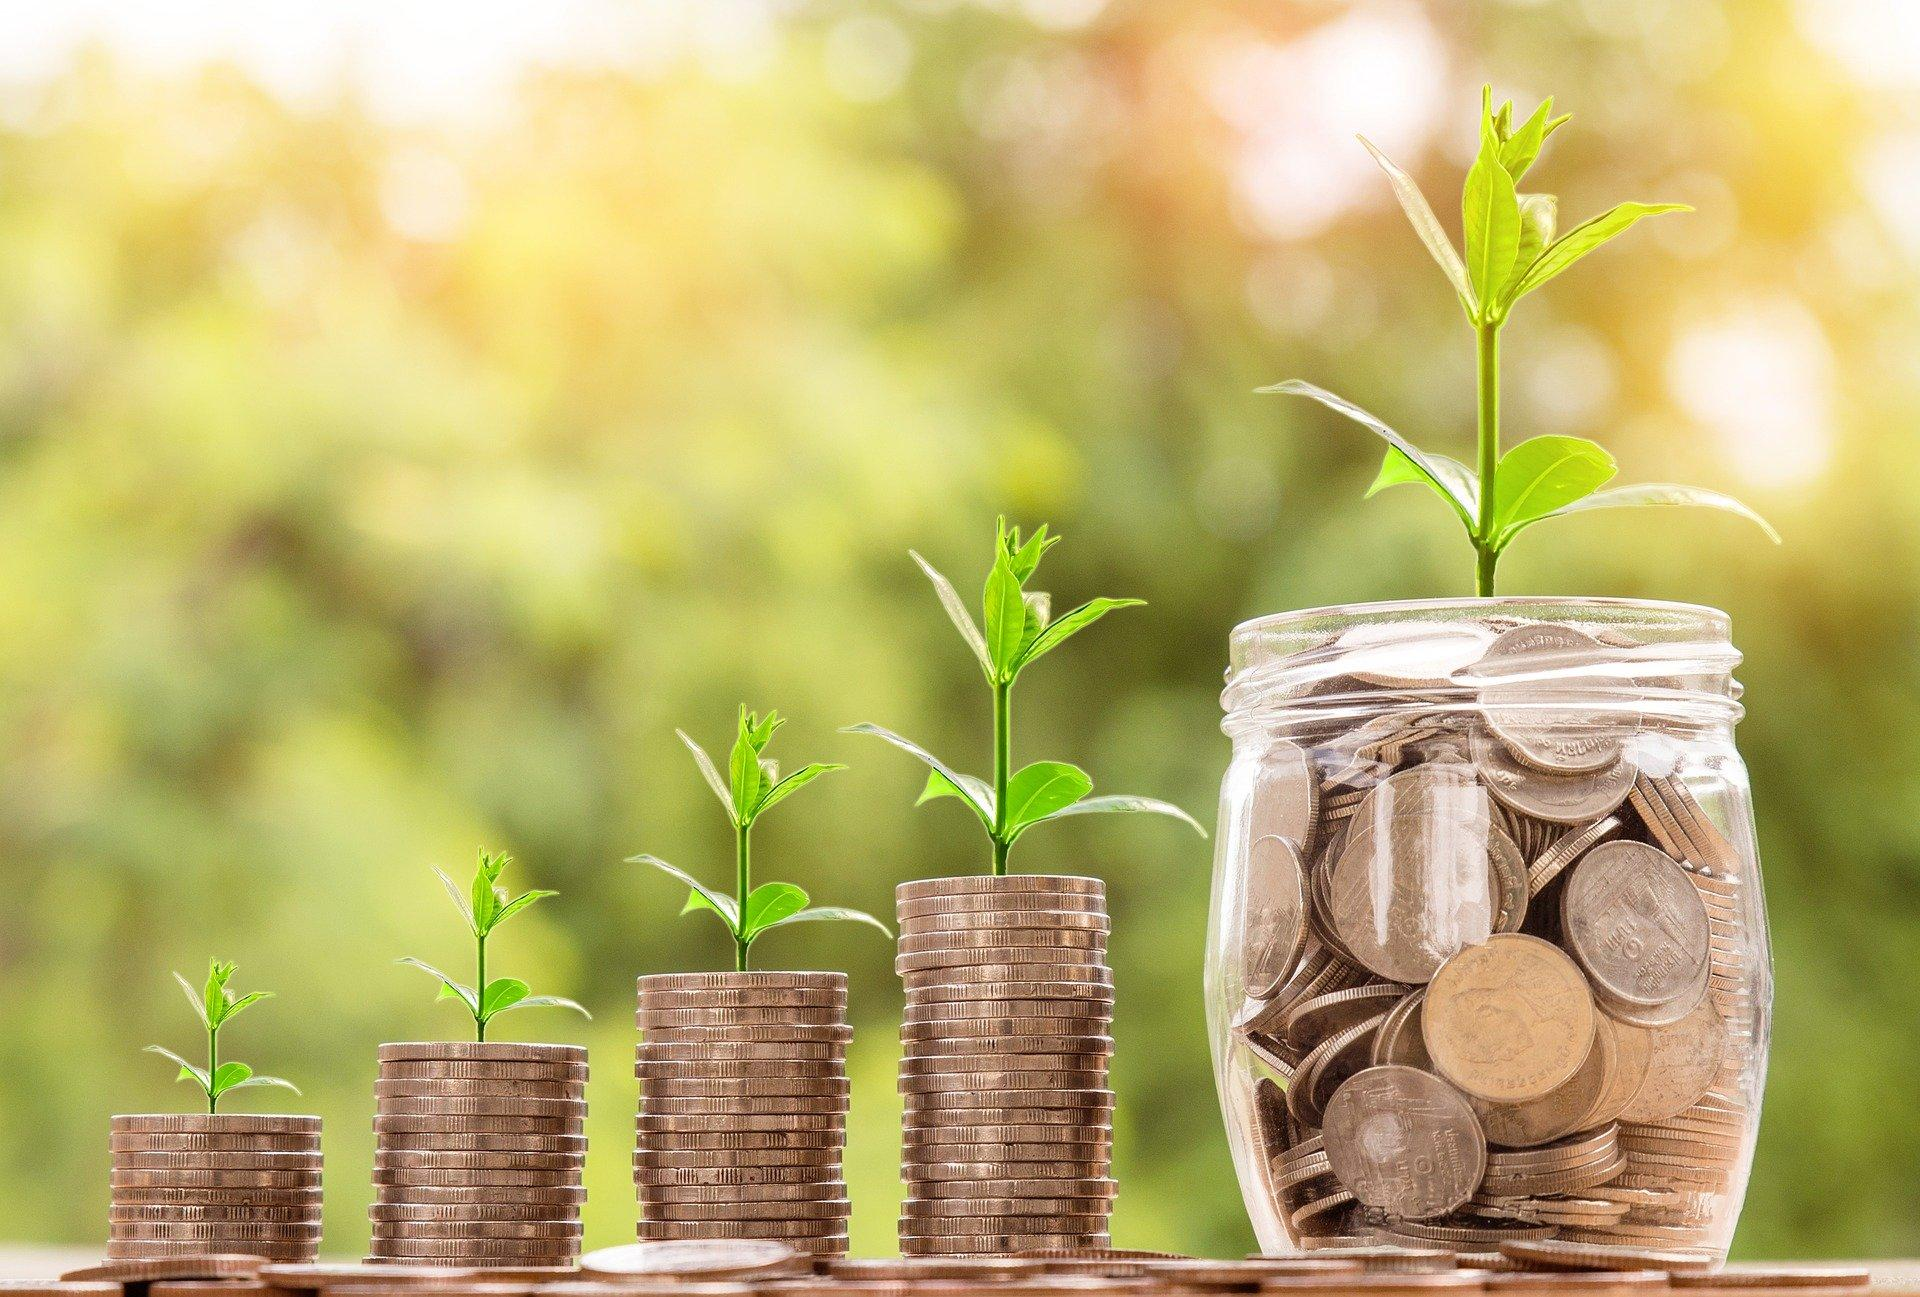 Tax Free Savings Accounts:  Using 2021's Contribution Limits Thumbnail